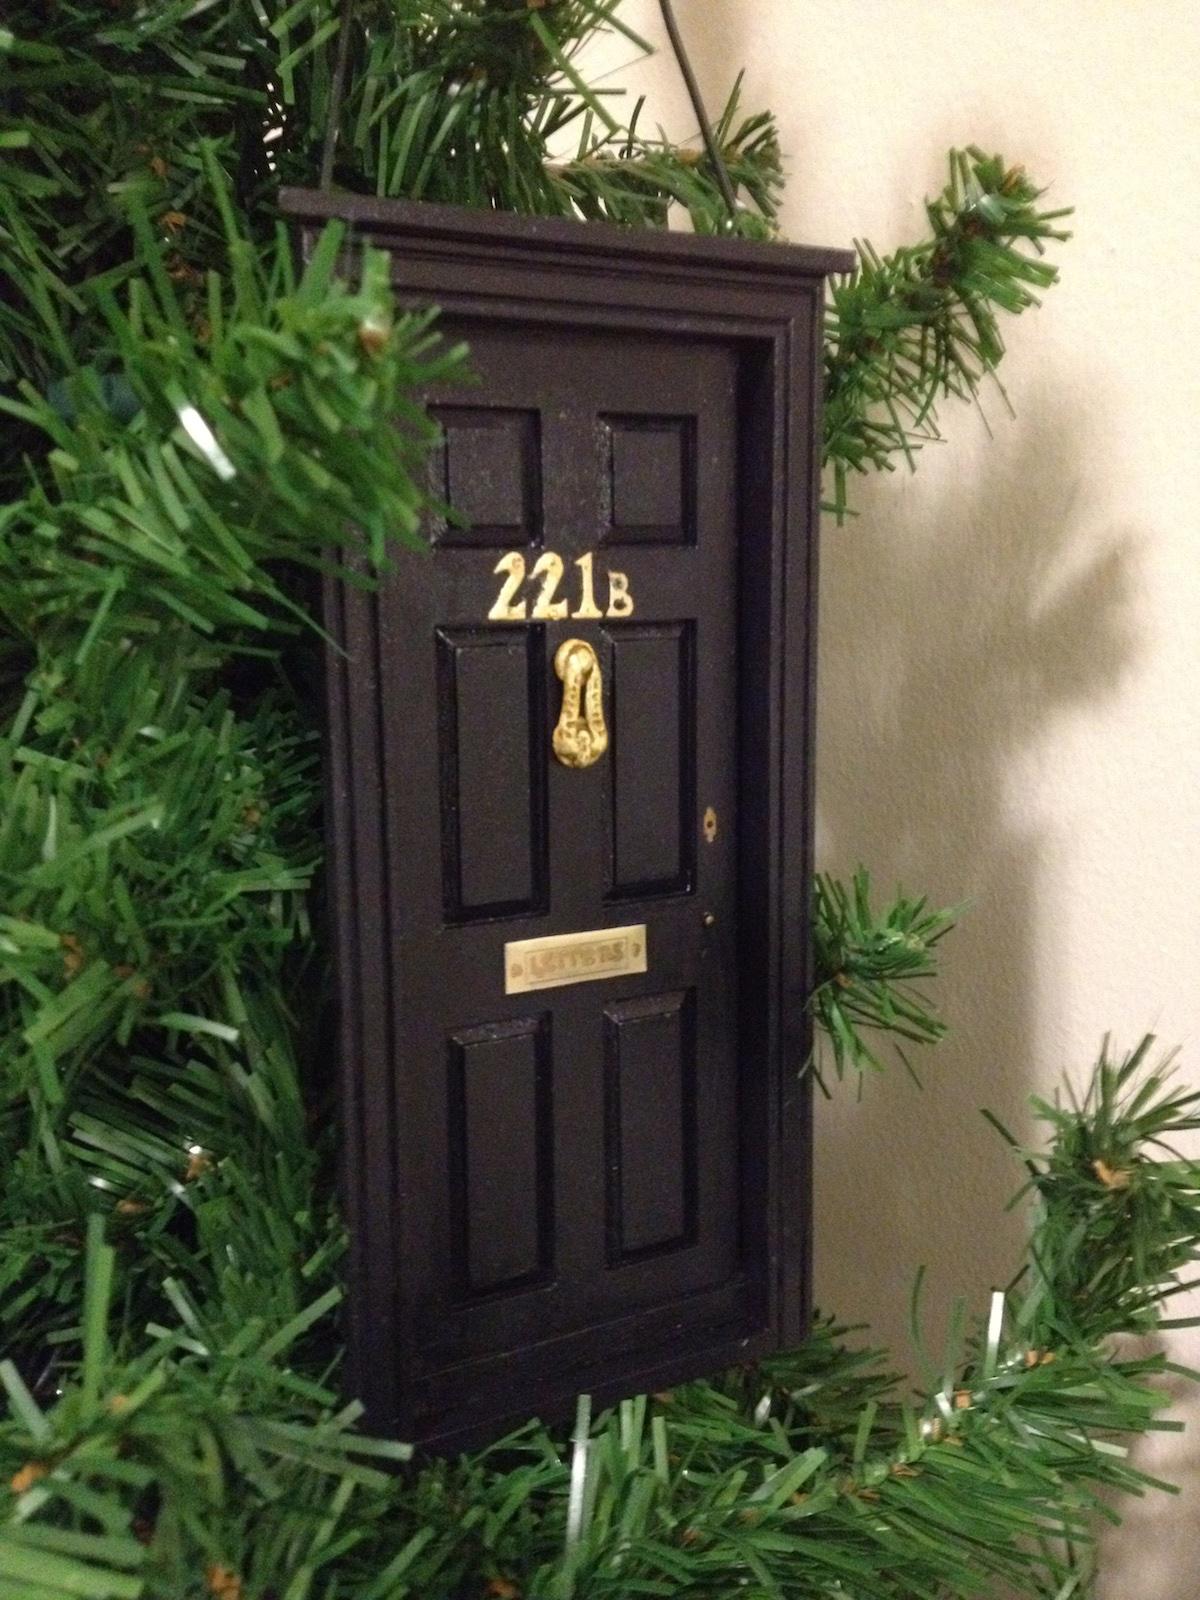 Make a 221B Baker Street Christmas Ornament (BBC Sherlock)